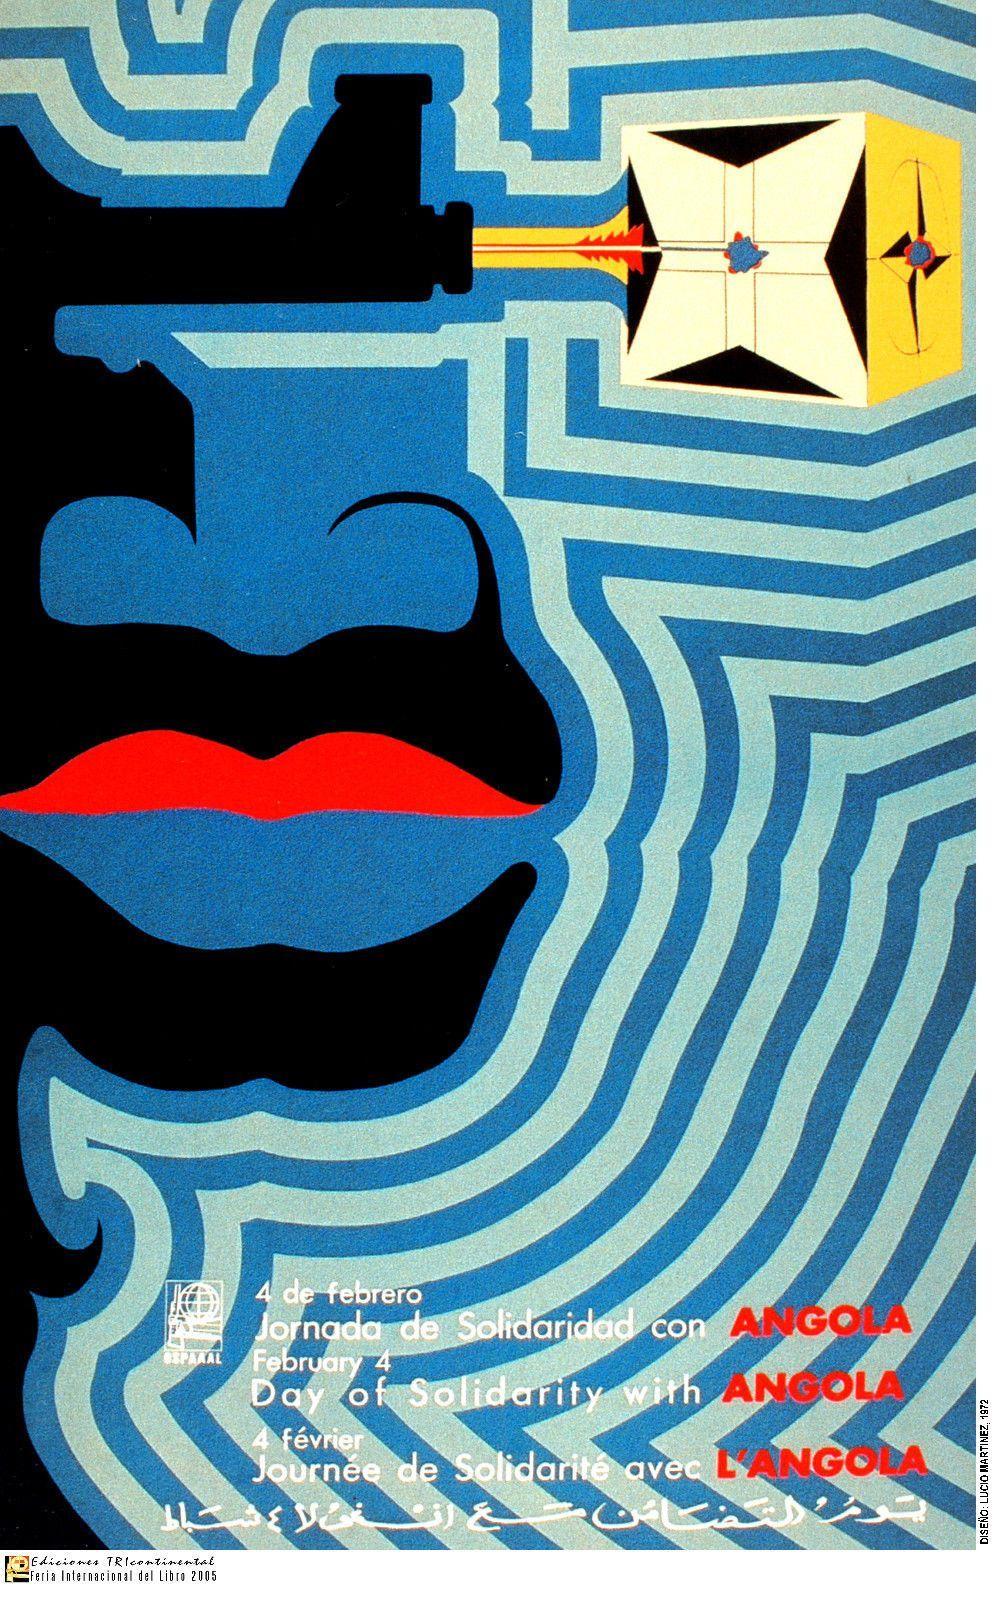 JAYZ JAY Z Pop Poster Decoration Room Art Wall Print 2x3 Feet 1